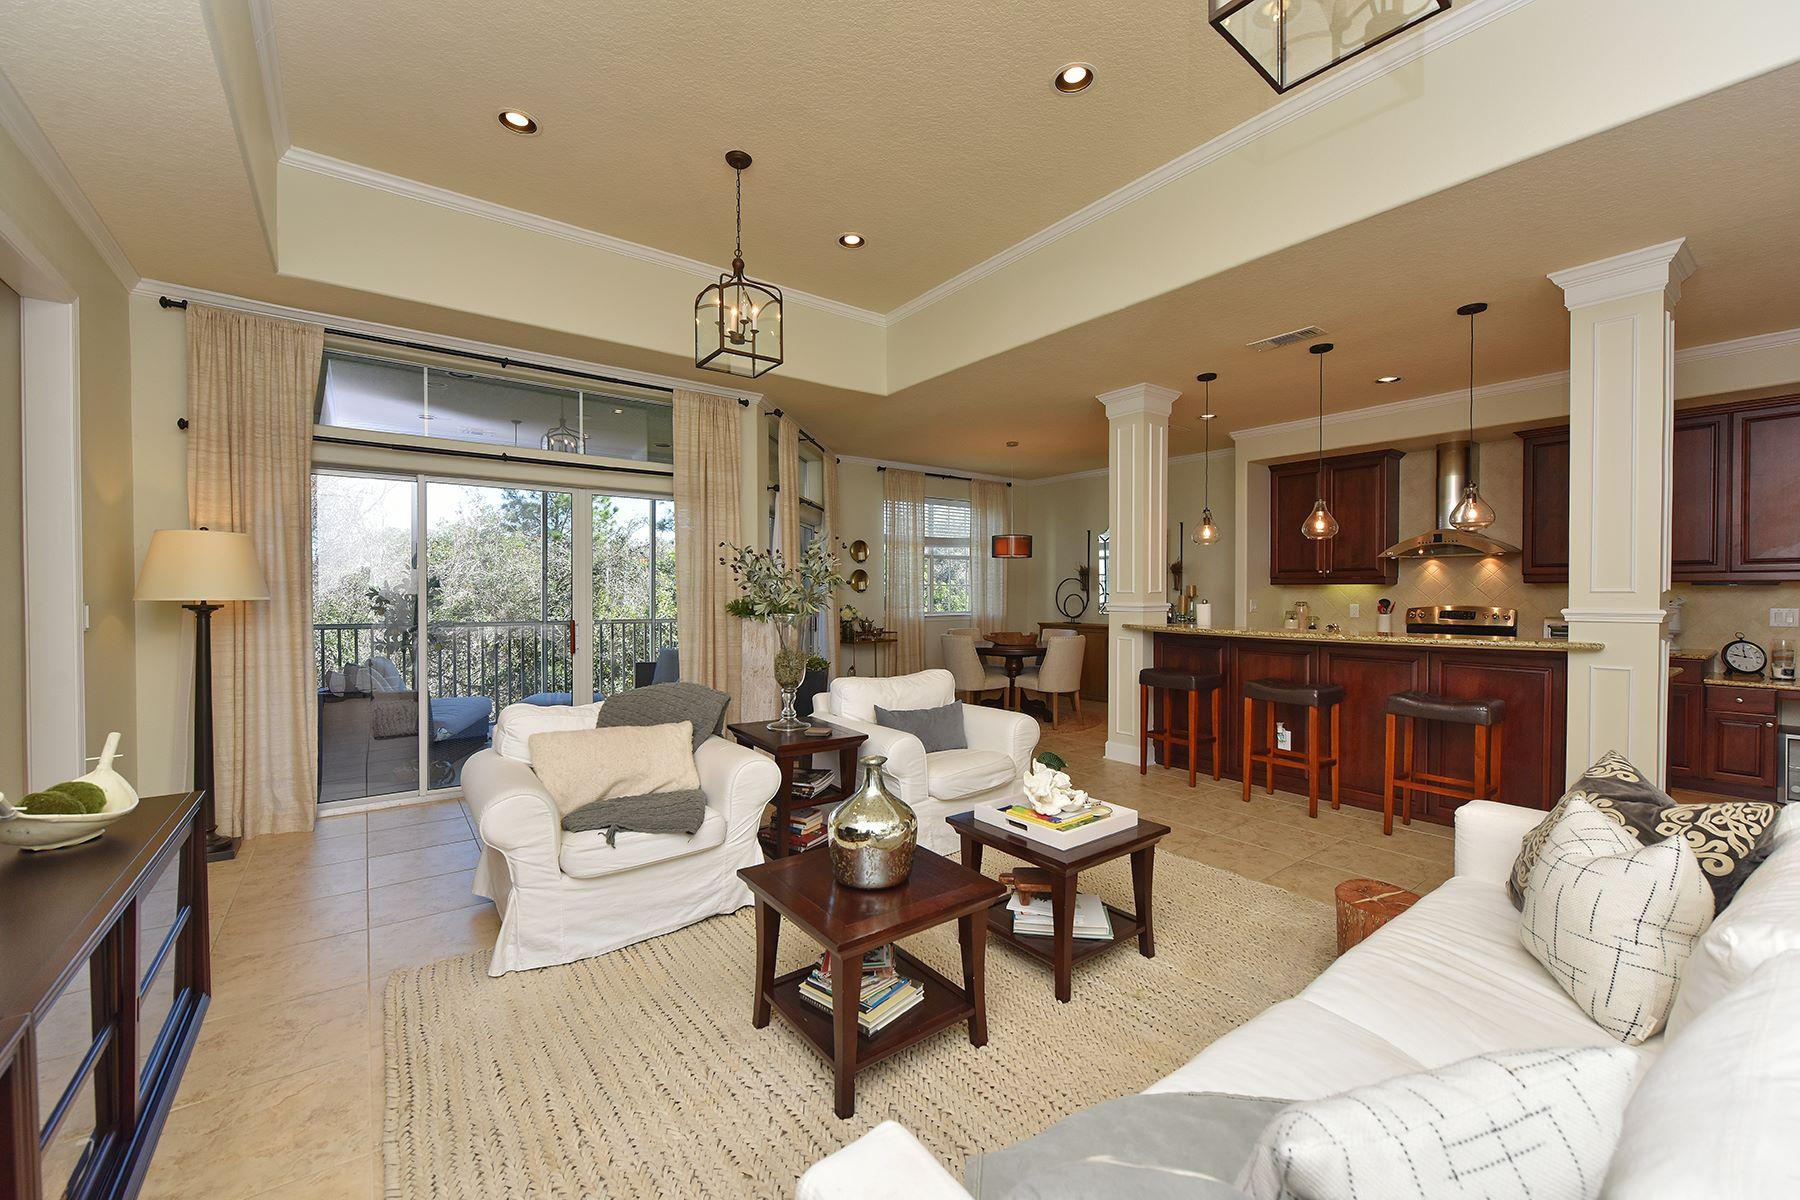 Condomínio para Venda às SAVANNAH PRESERVE 7945 St Simons St - University Park, Florida, 34201 Estados Unidos